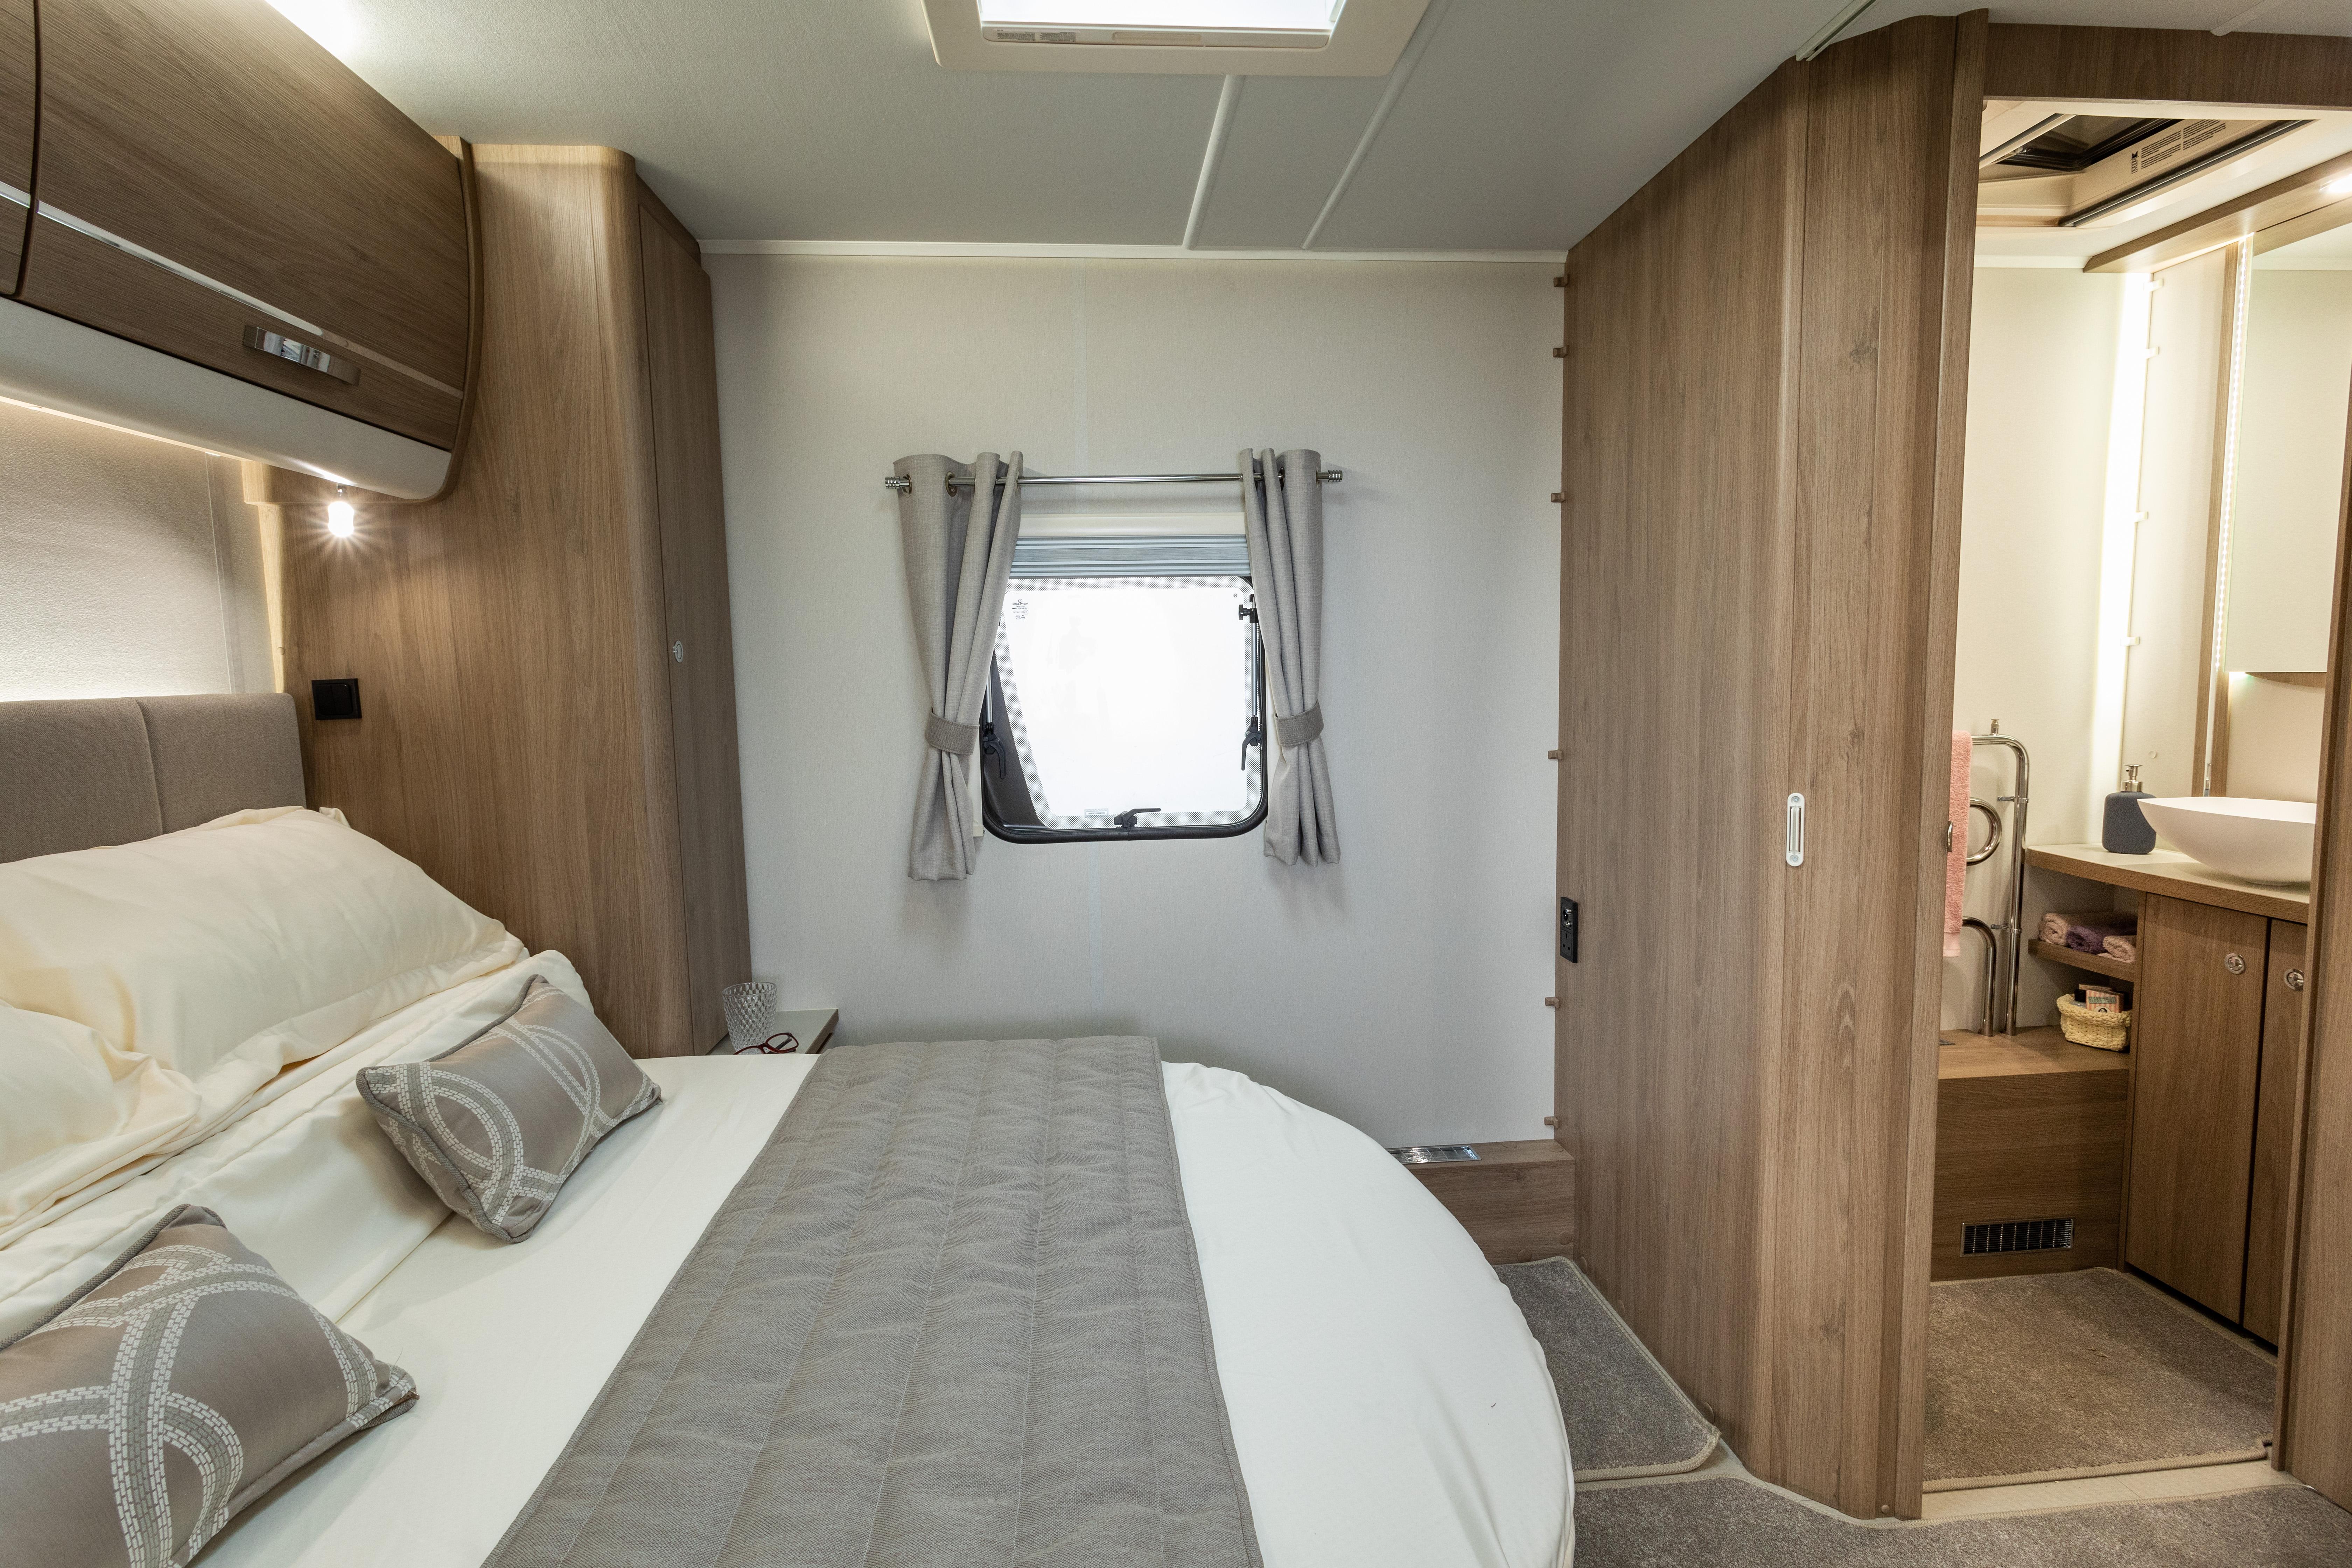 CAPIRO 550 - Island Bed